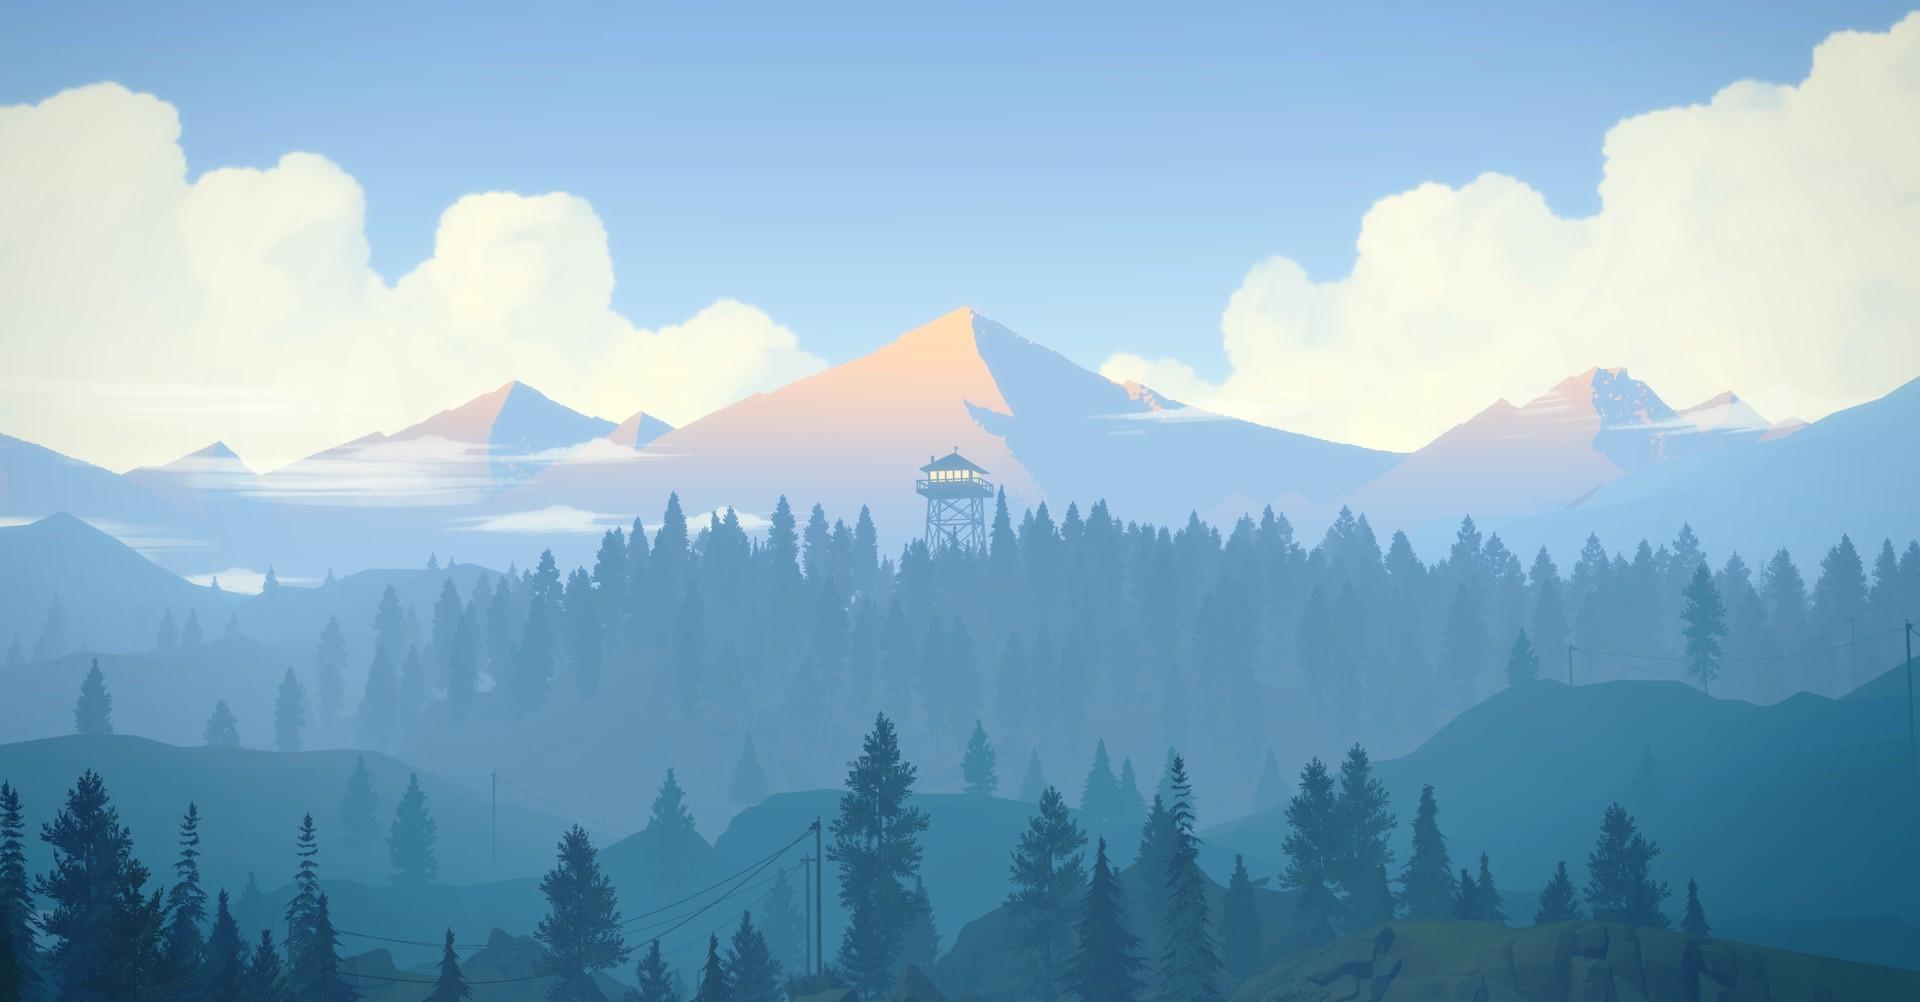 firewatch hd wallpaper,mountainous landforms,mountain,sky,mountain range,nature